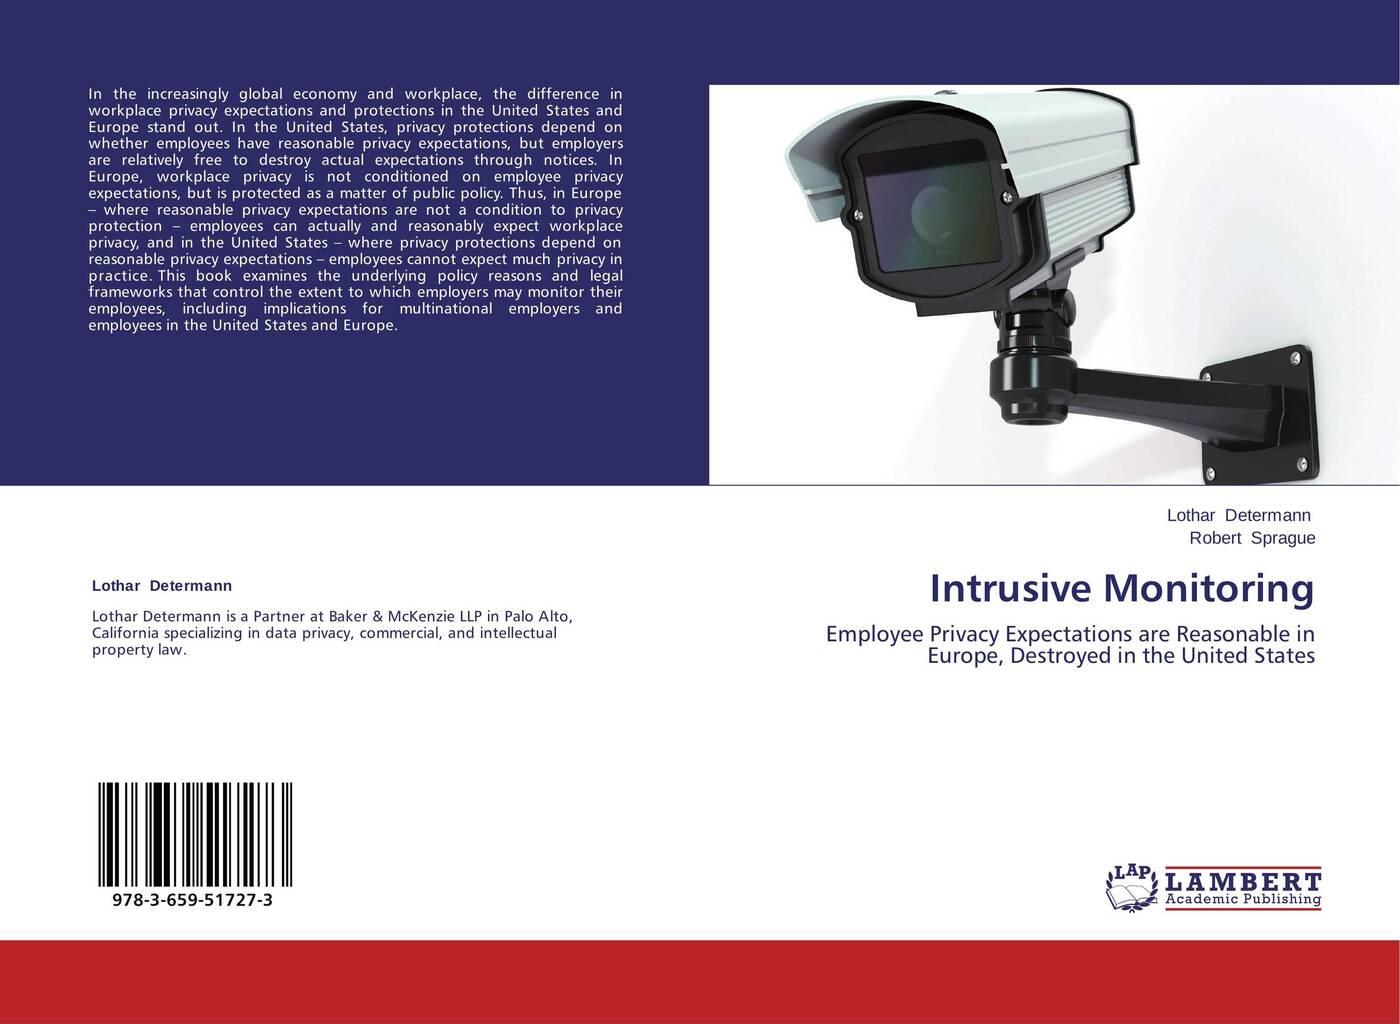 Lothar Determann and Robert Sprague Intrusive Monitoring цена в Москве и Питере